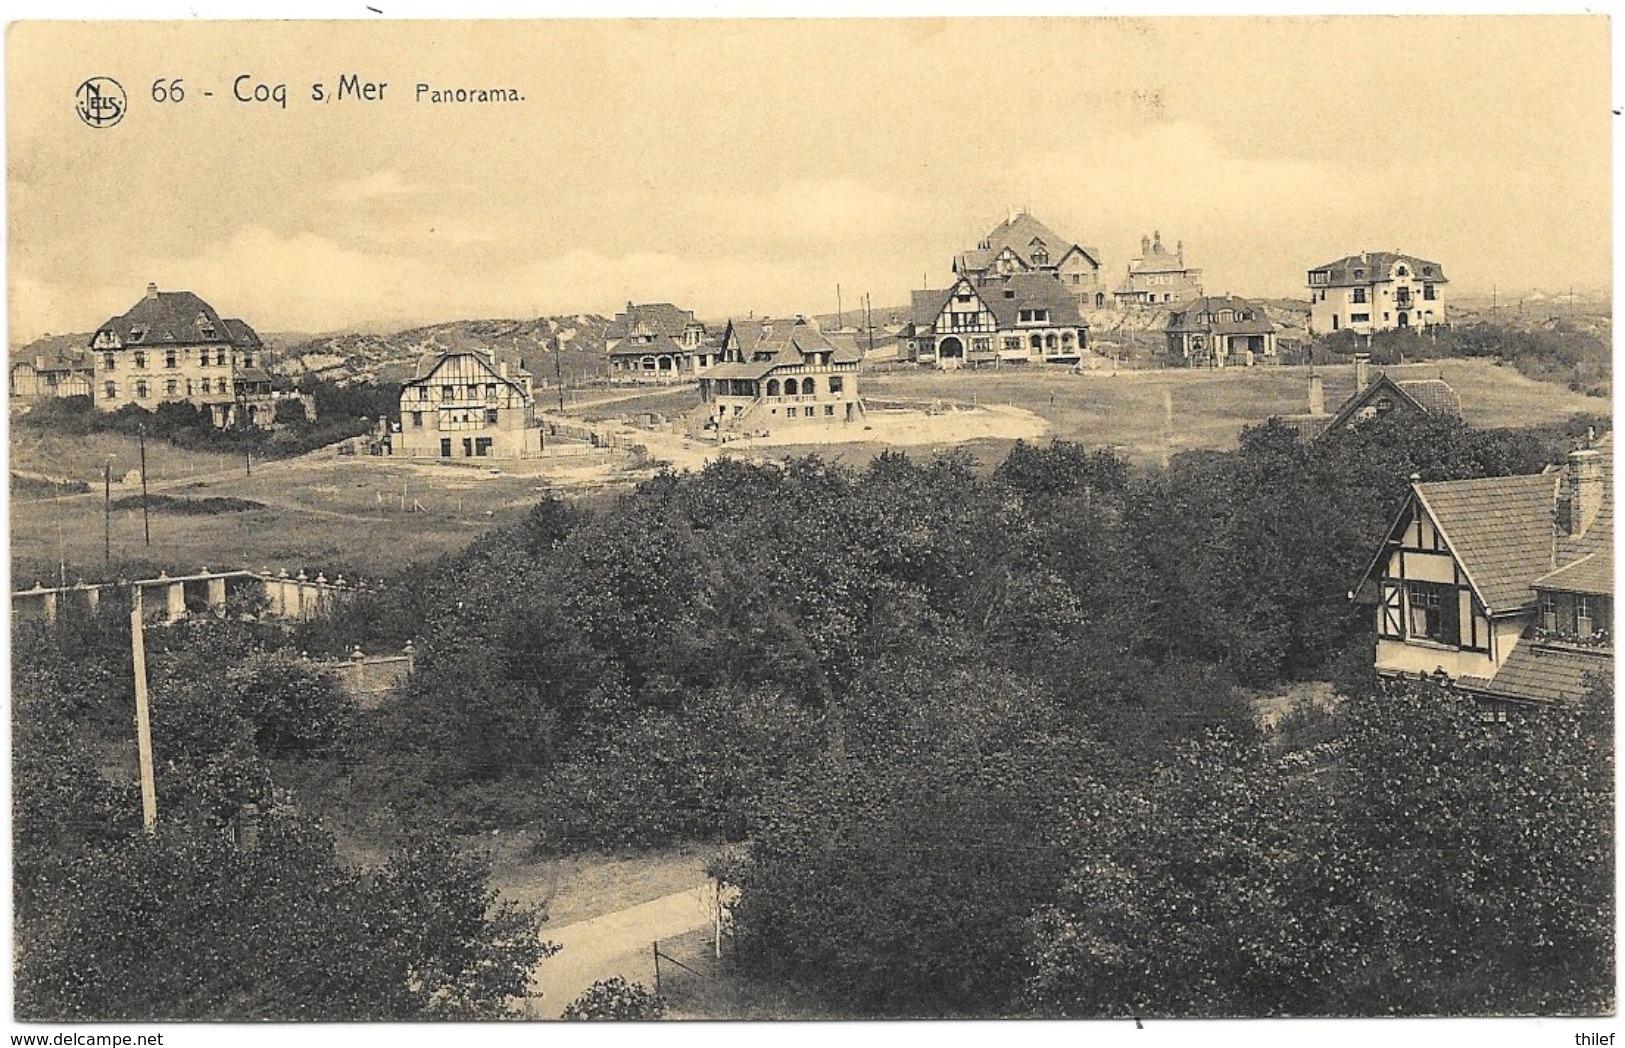 Coq-sur-Mer NA68: Panorama 1932 - De Haan